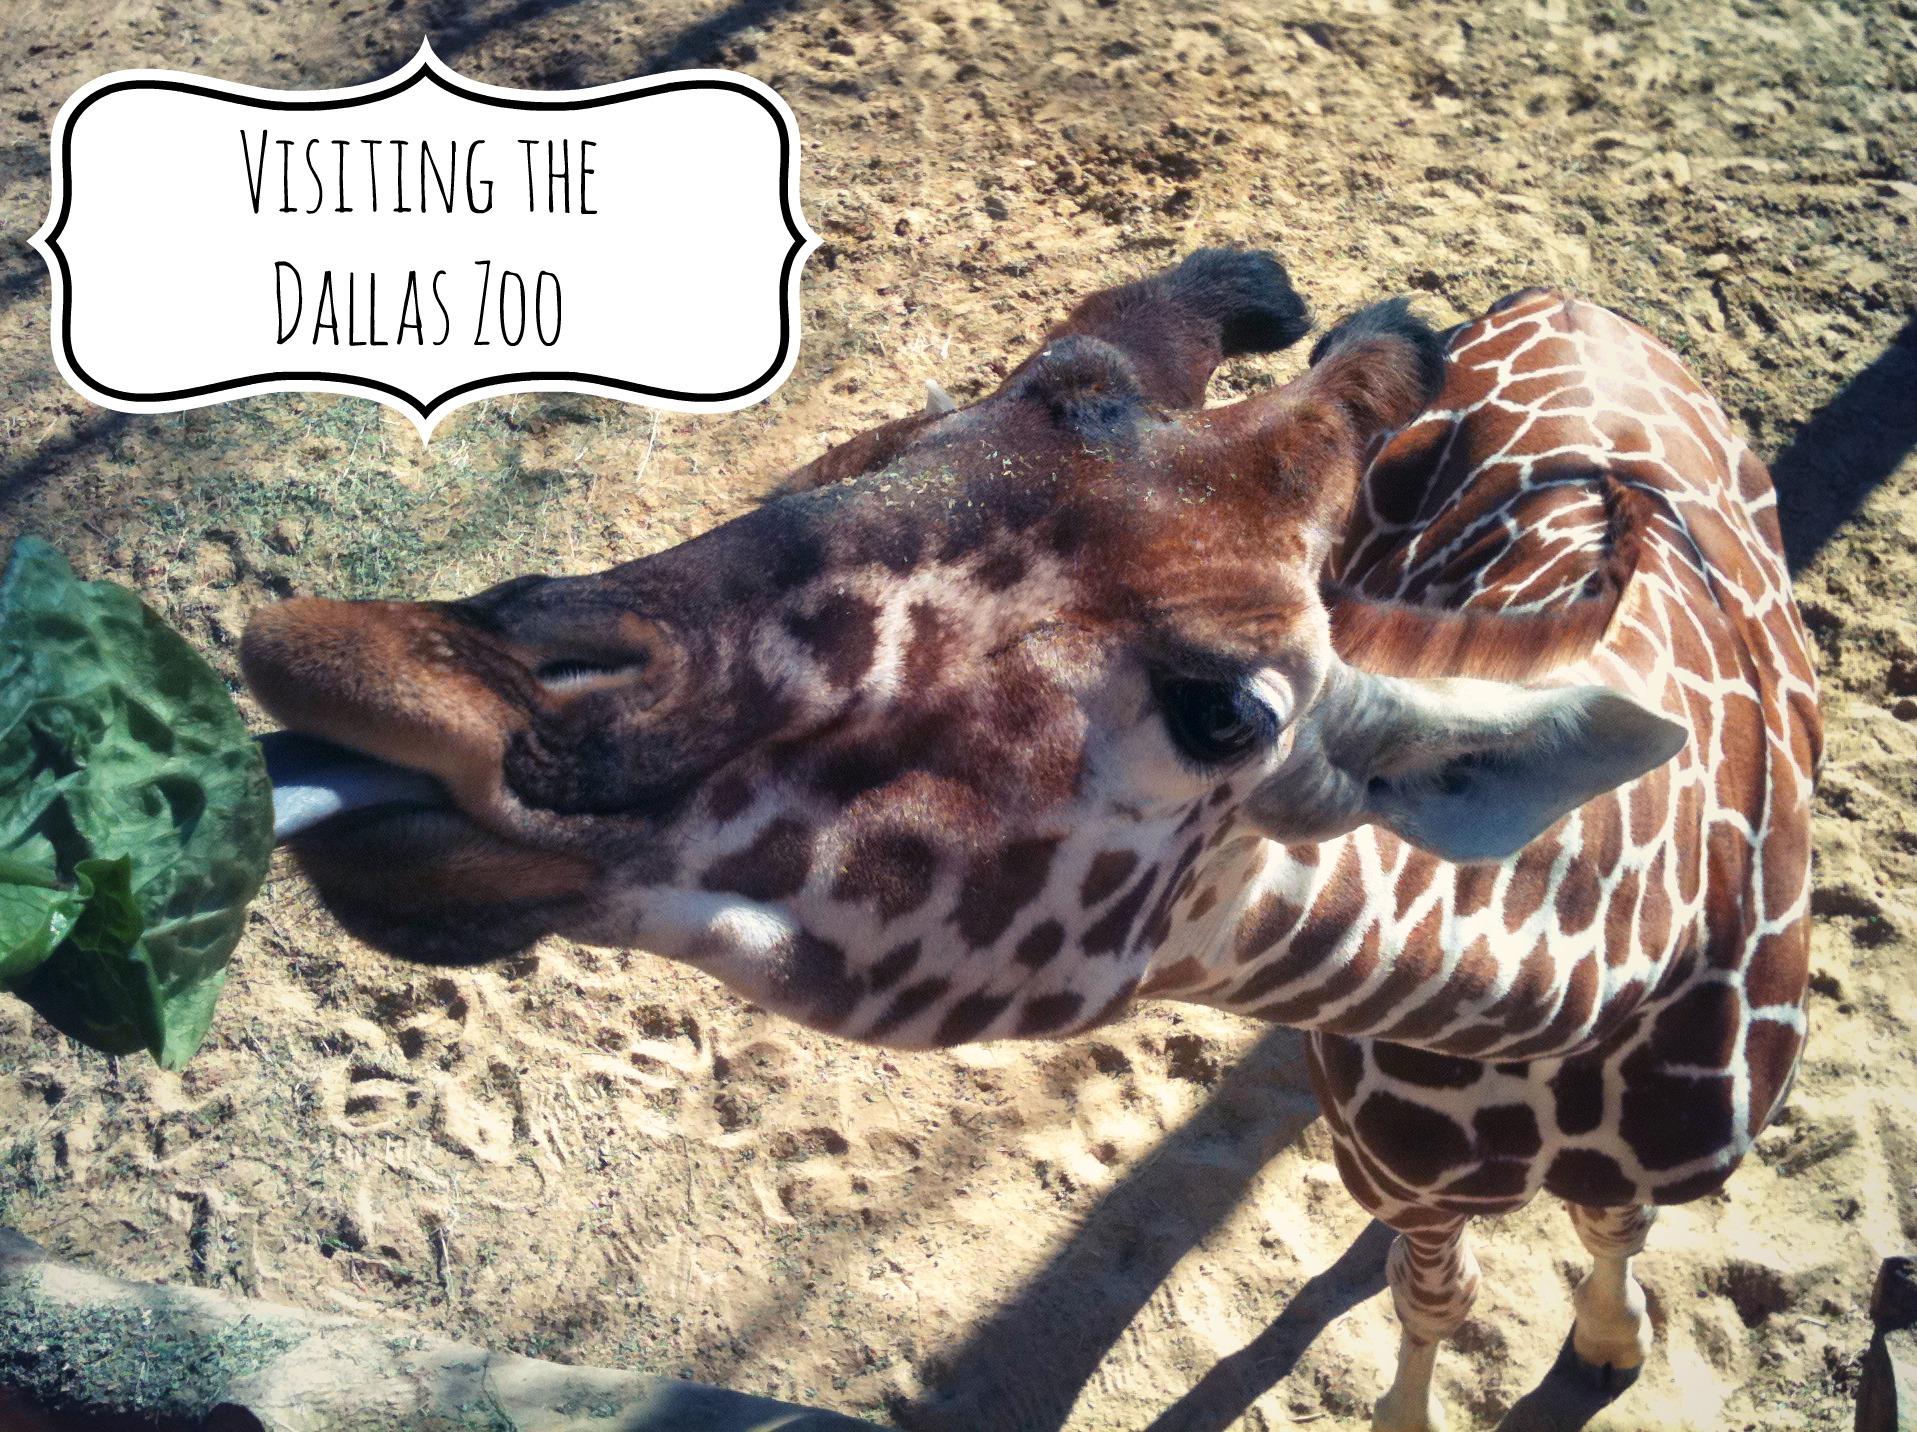 Dallas Zoo Coupons Printable Best Image Konpax 2018